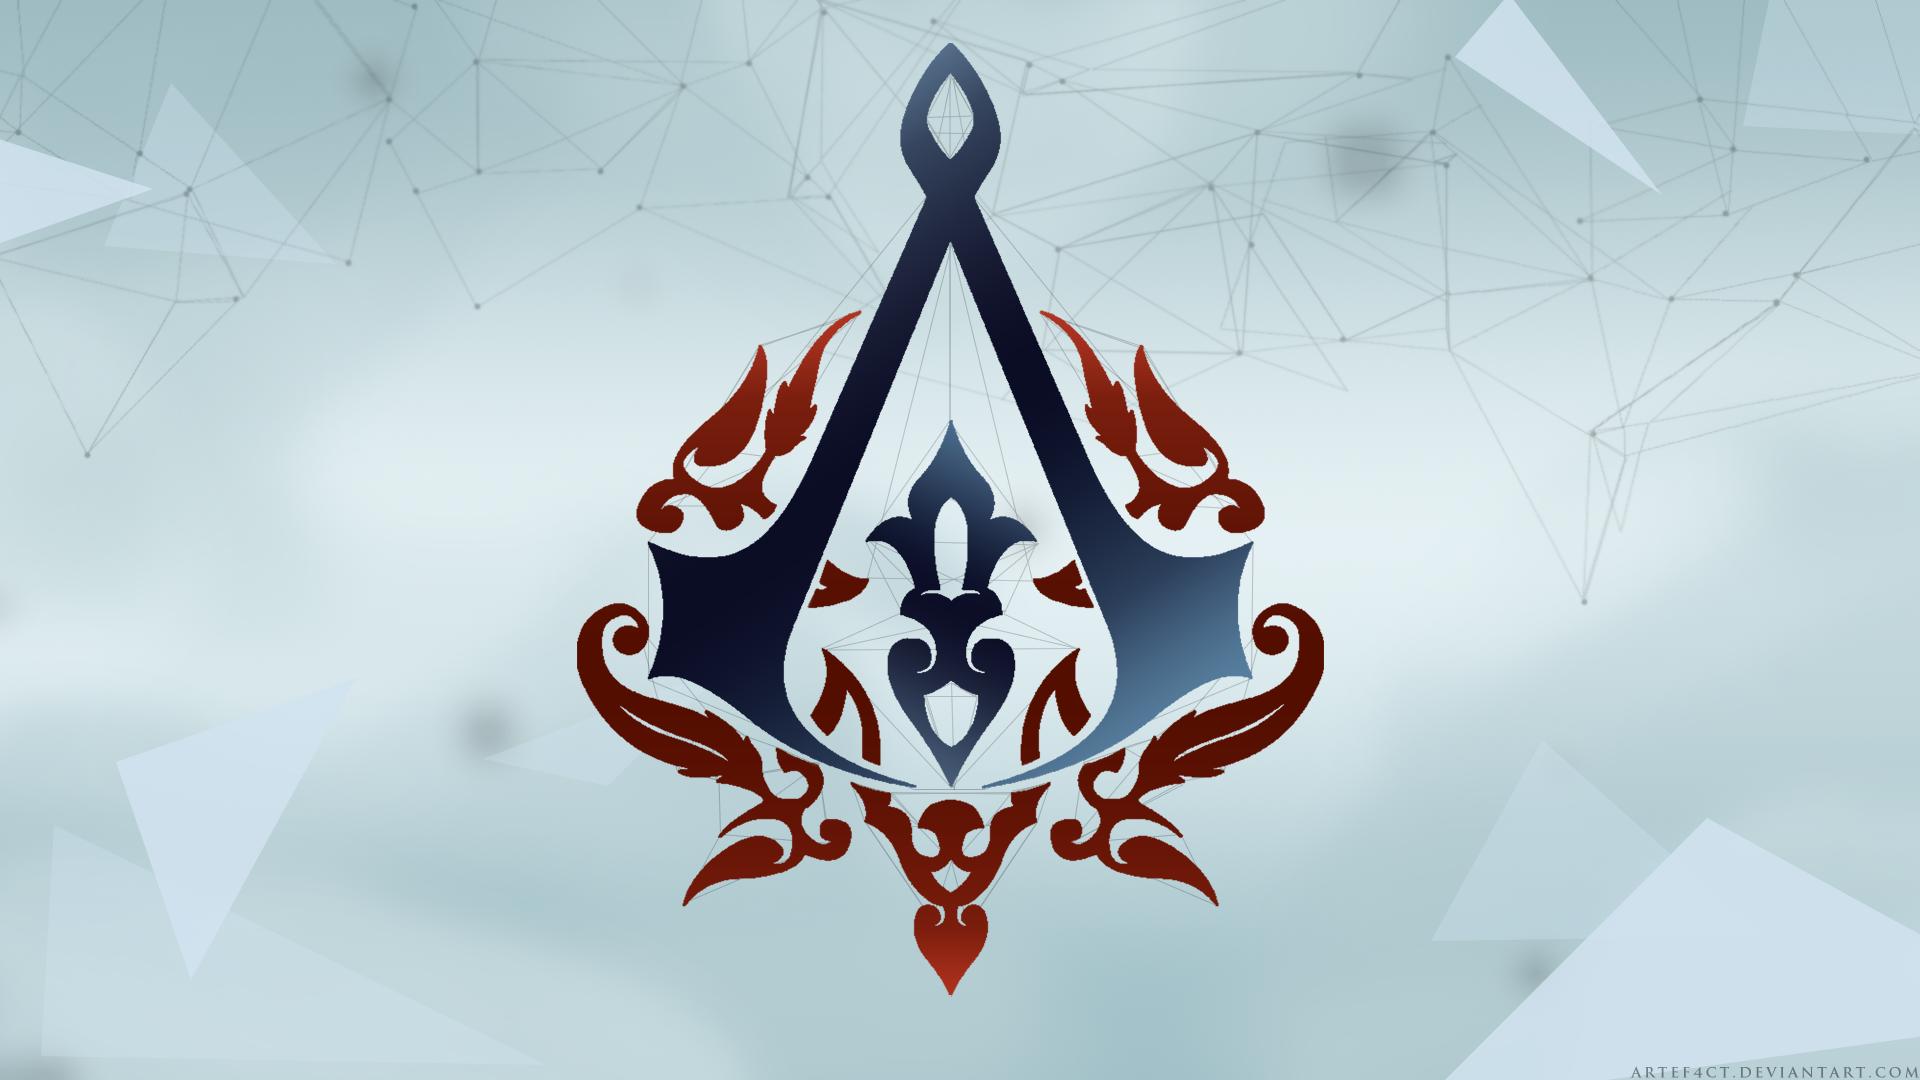 Assassins Creed  Ottoman Insignia By ArteF4ct On DeviantArt